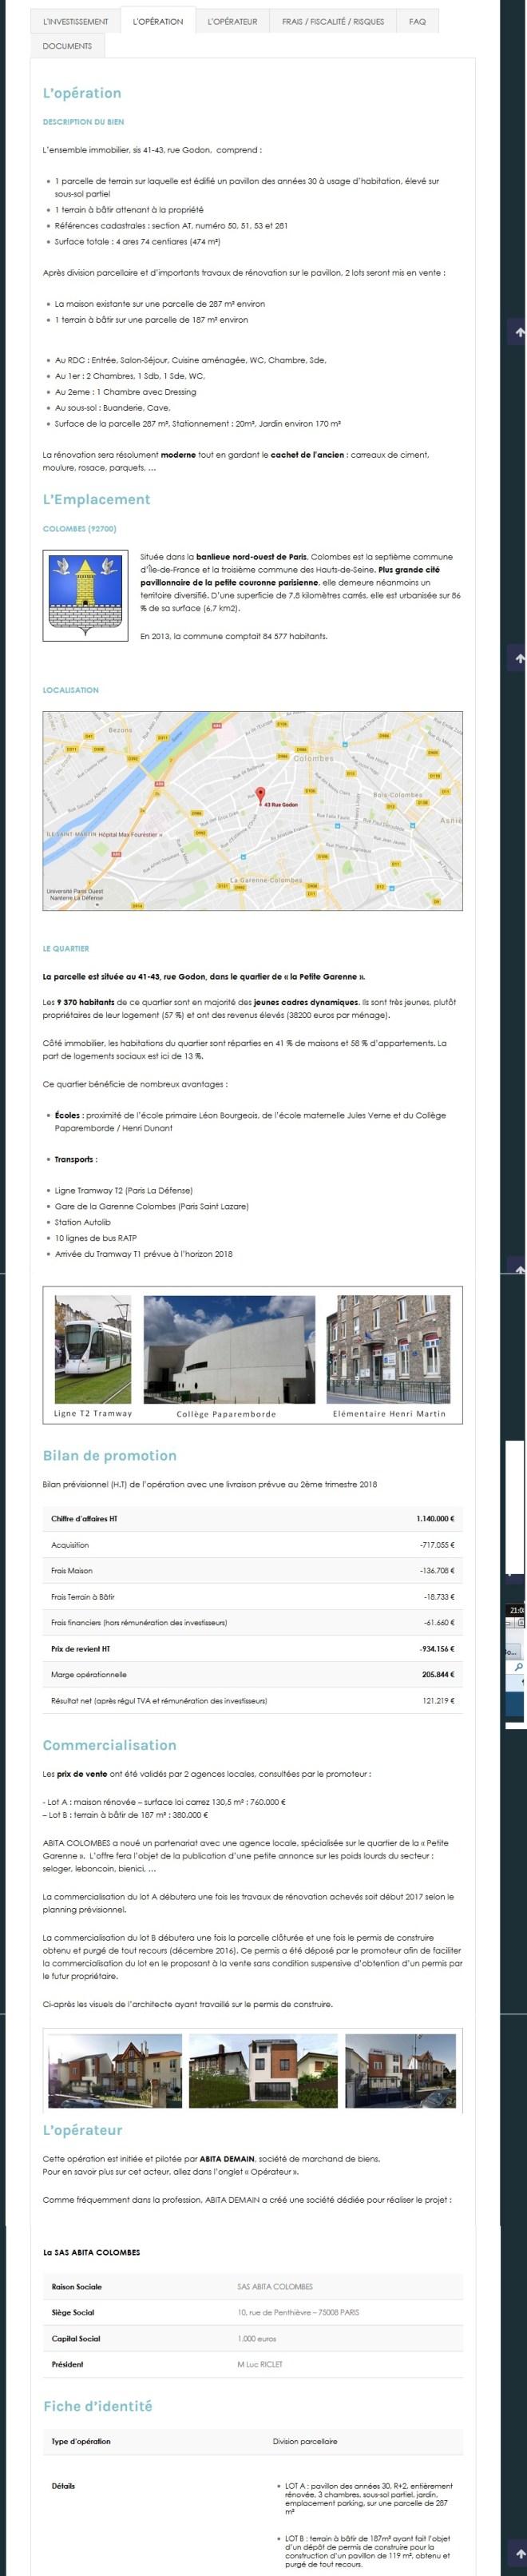 immocratie-crowdfunding-crowdlending-immobilier-projet-03